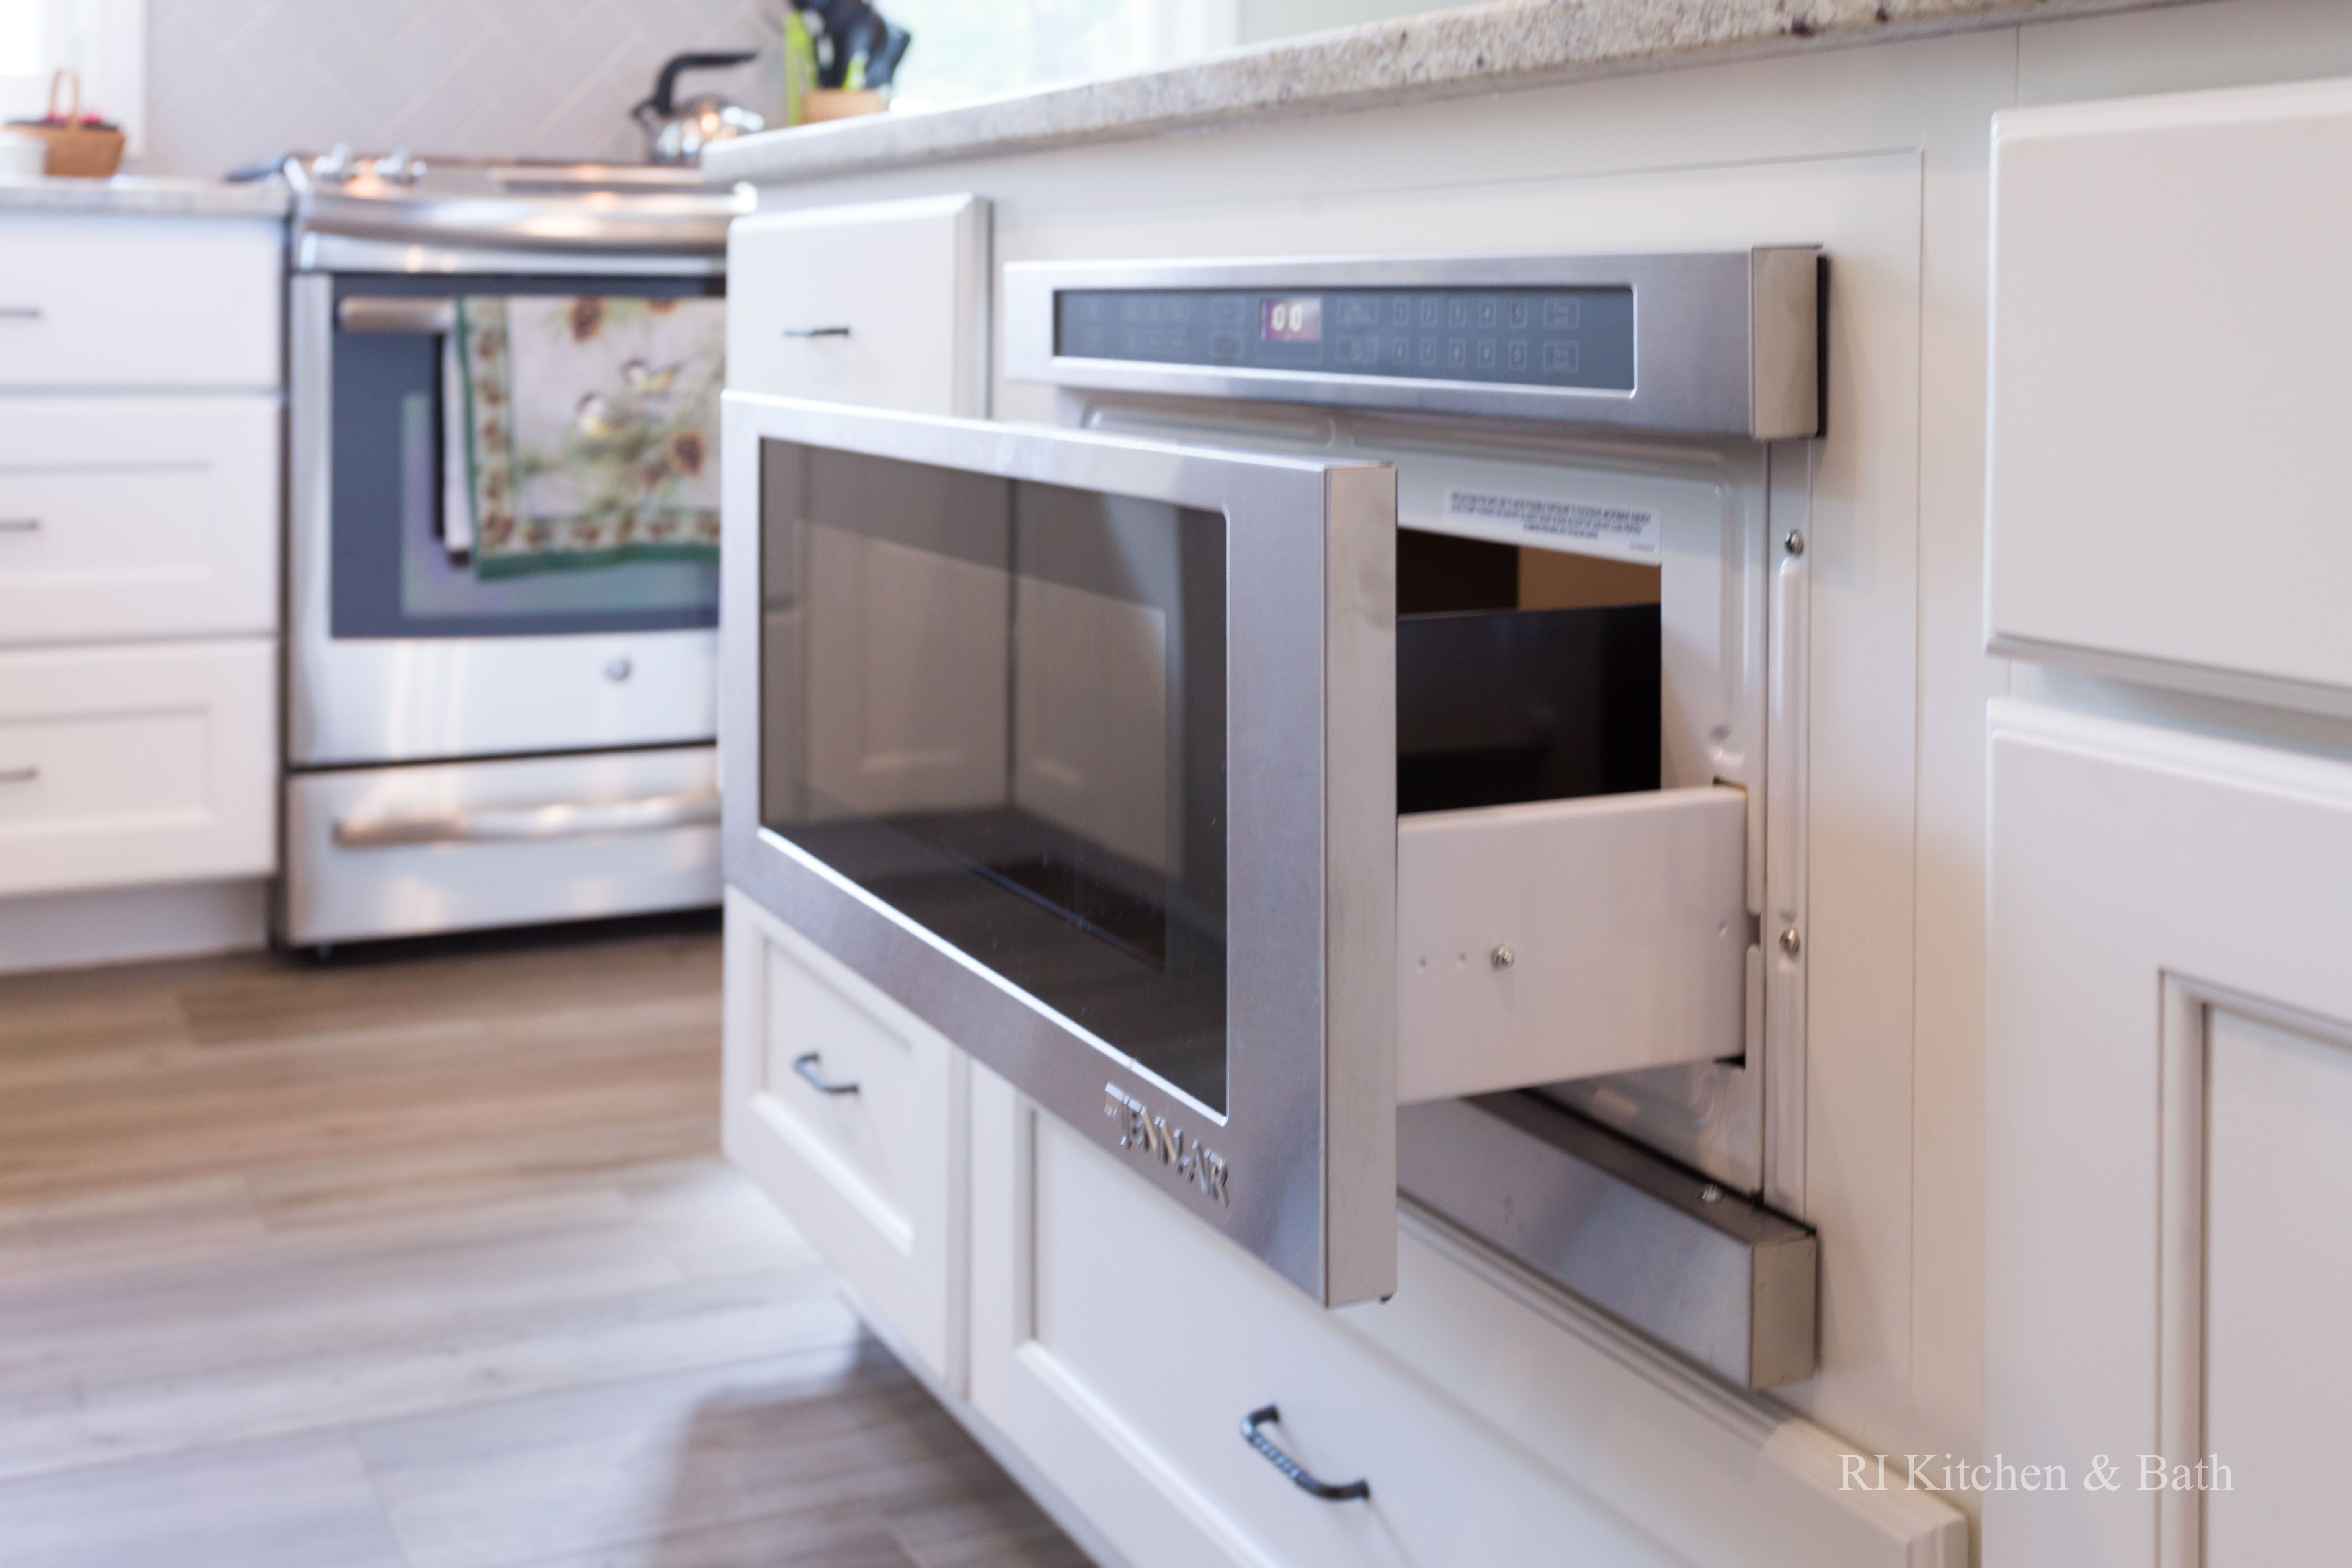 Lakeside Kitchen Designed By RI Kitchen U0026 Bath #RIKB #TransitionalKitchen  #StainlessSteel #WhitePaintedCabinets